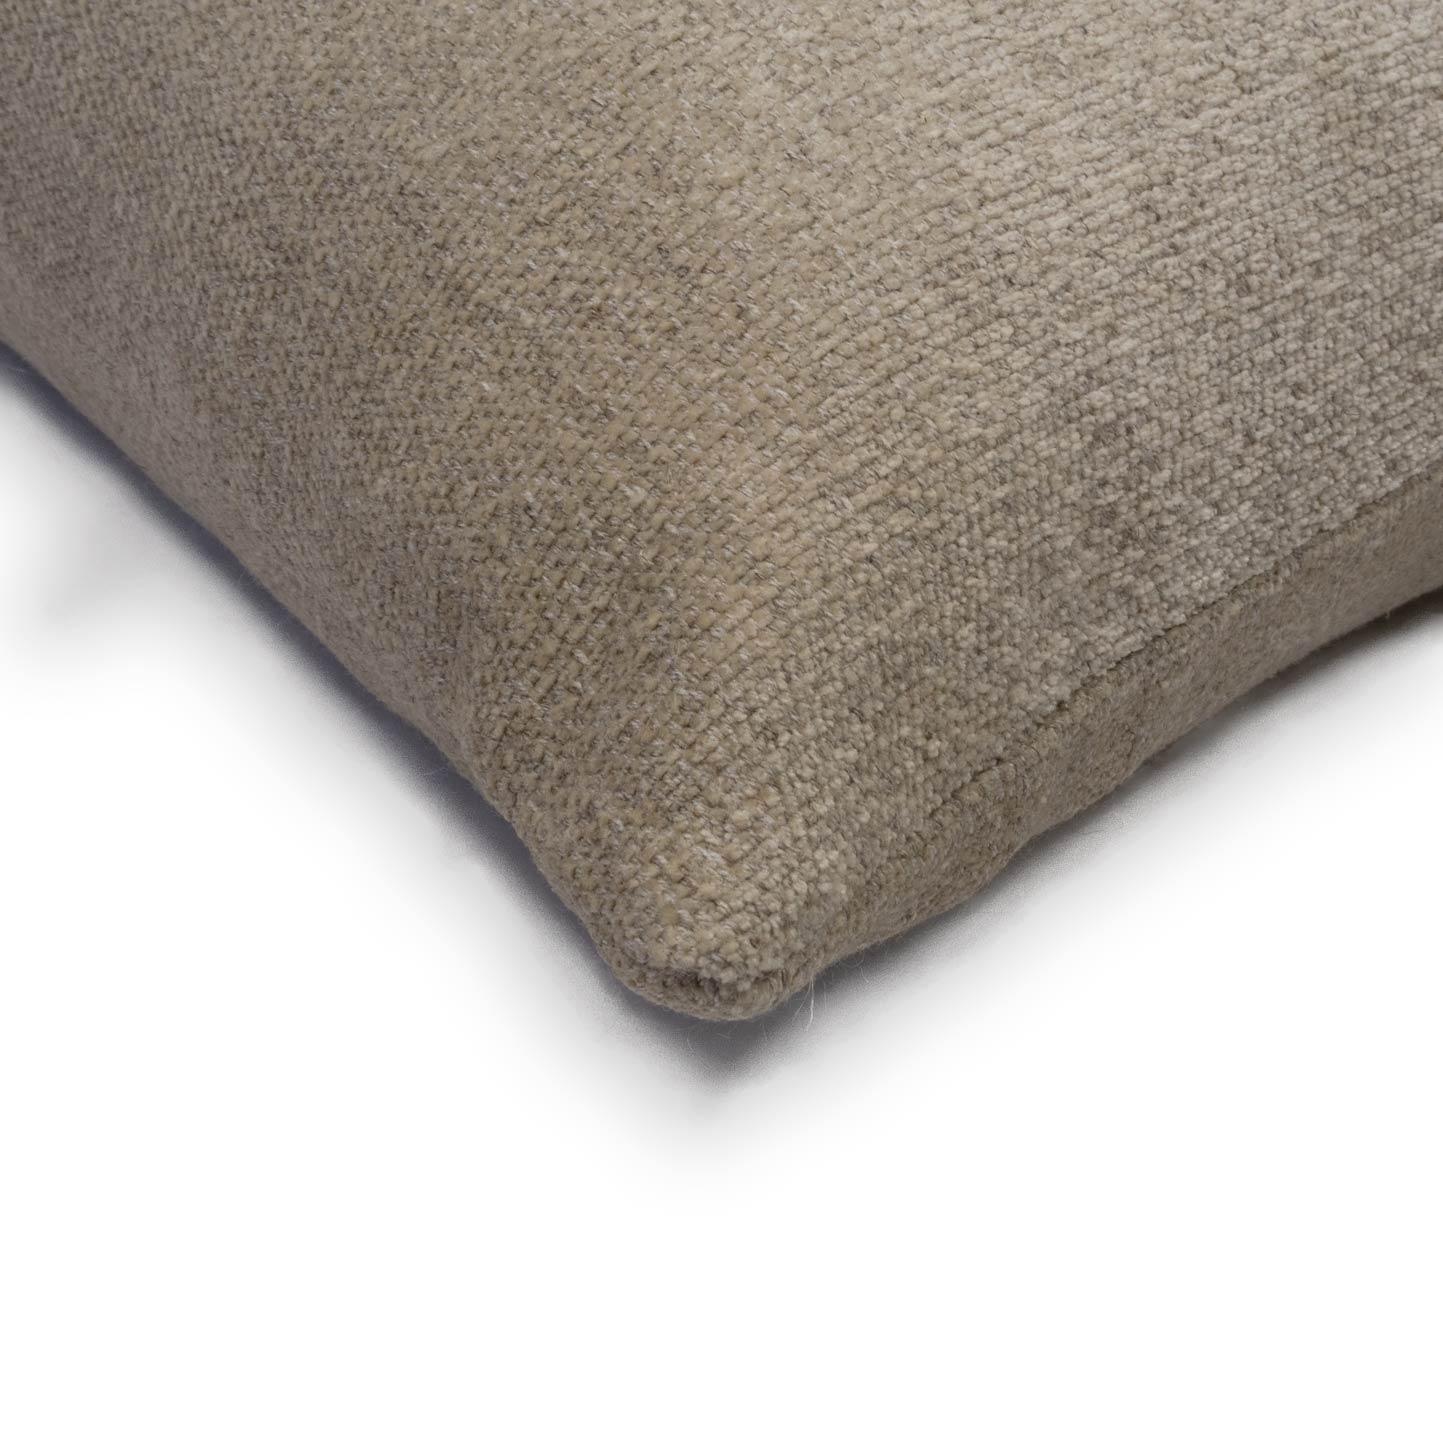 cushion-st.moritz-side